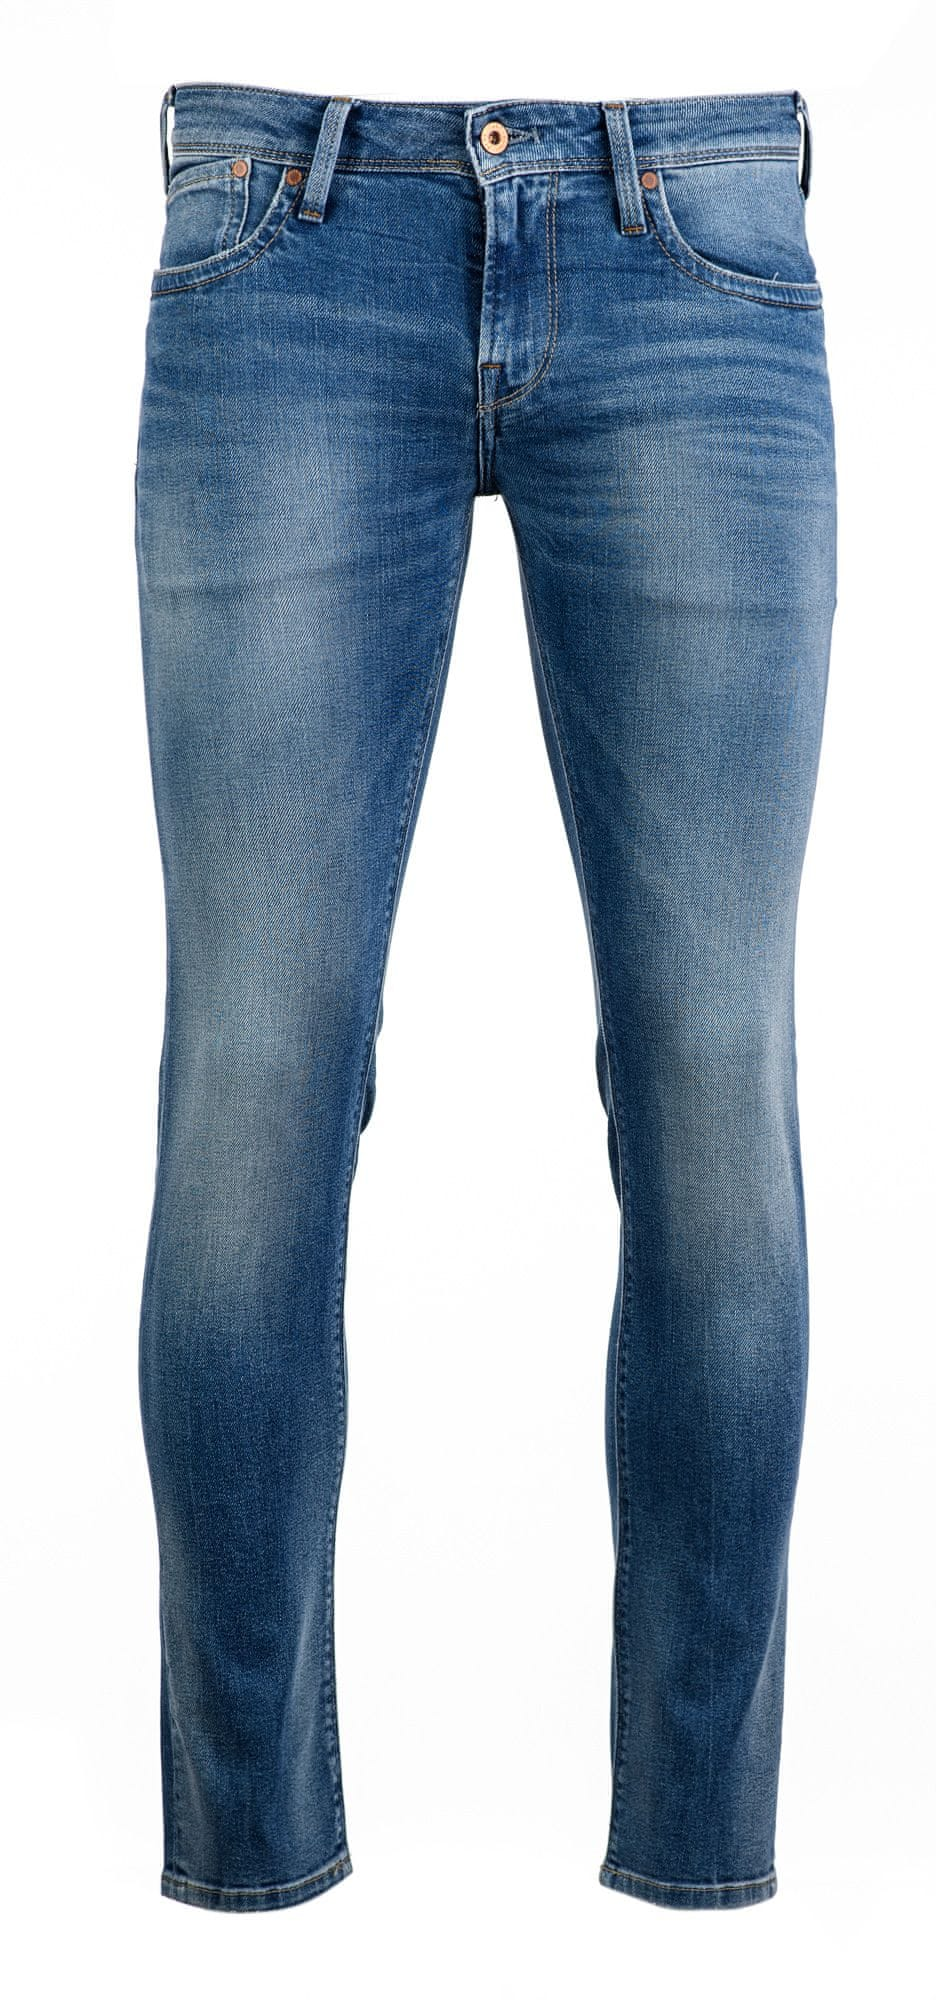 Pepe Jeans férfi farmer Hatch 34/34 kék